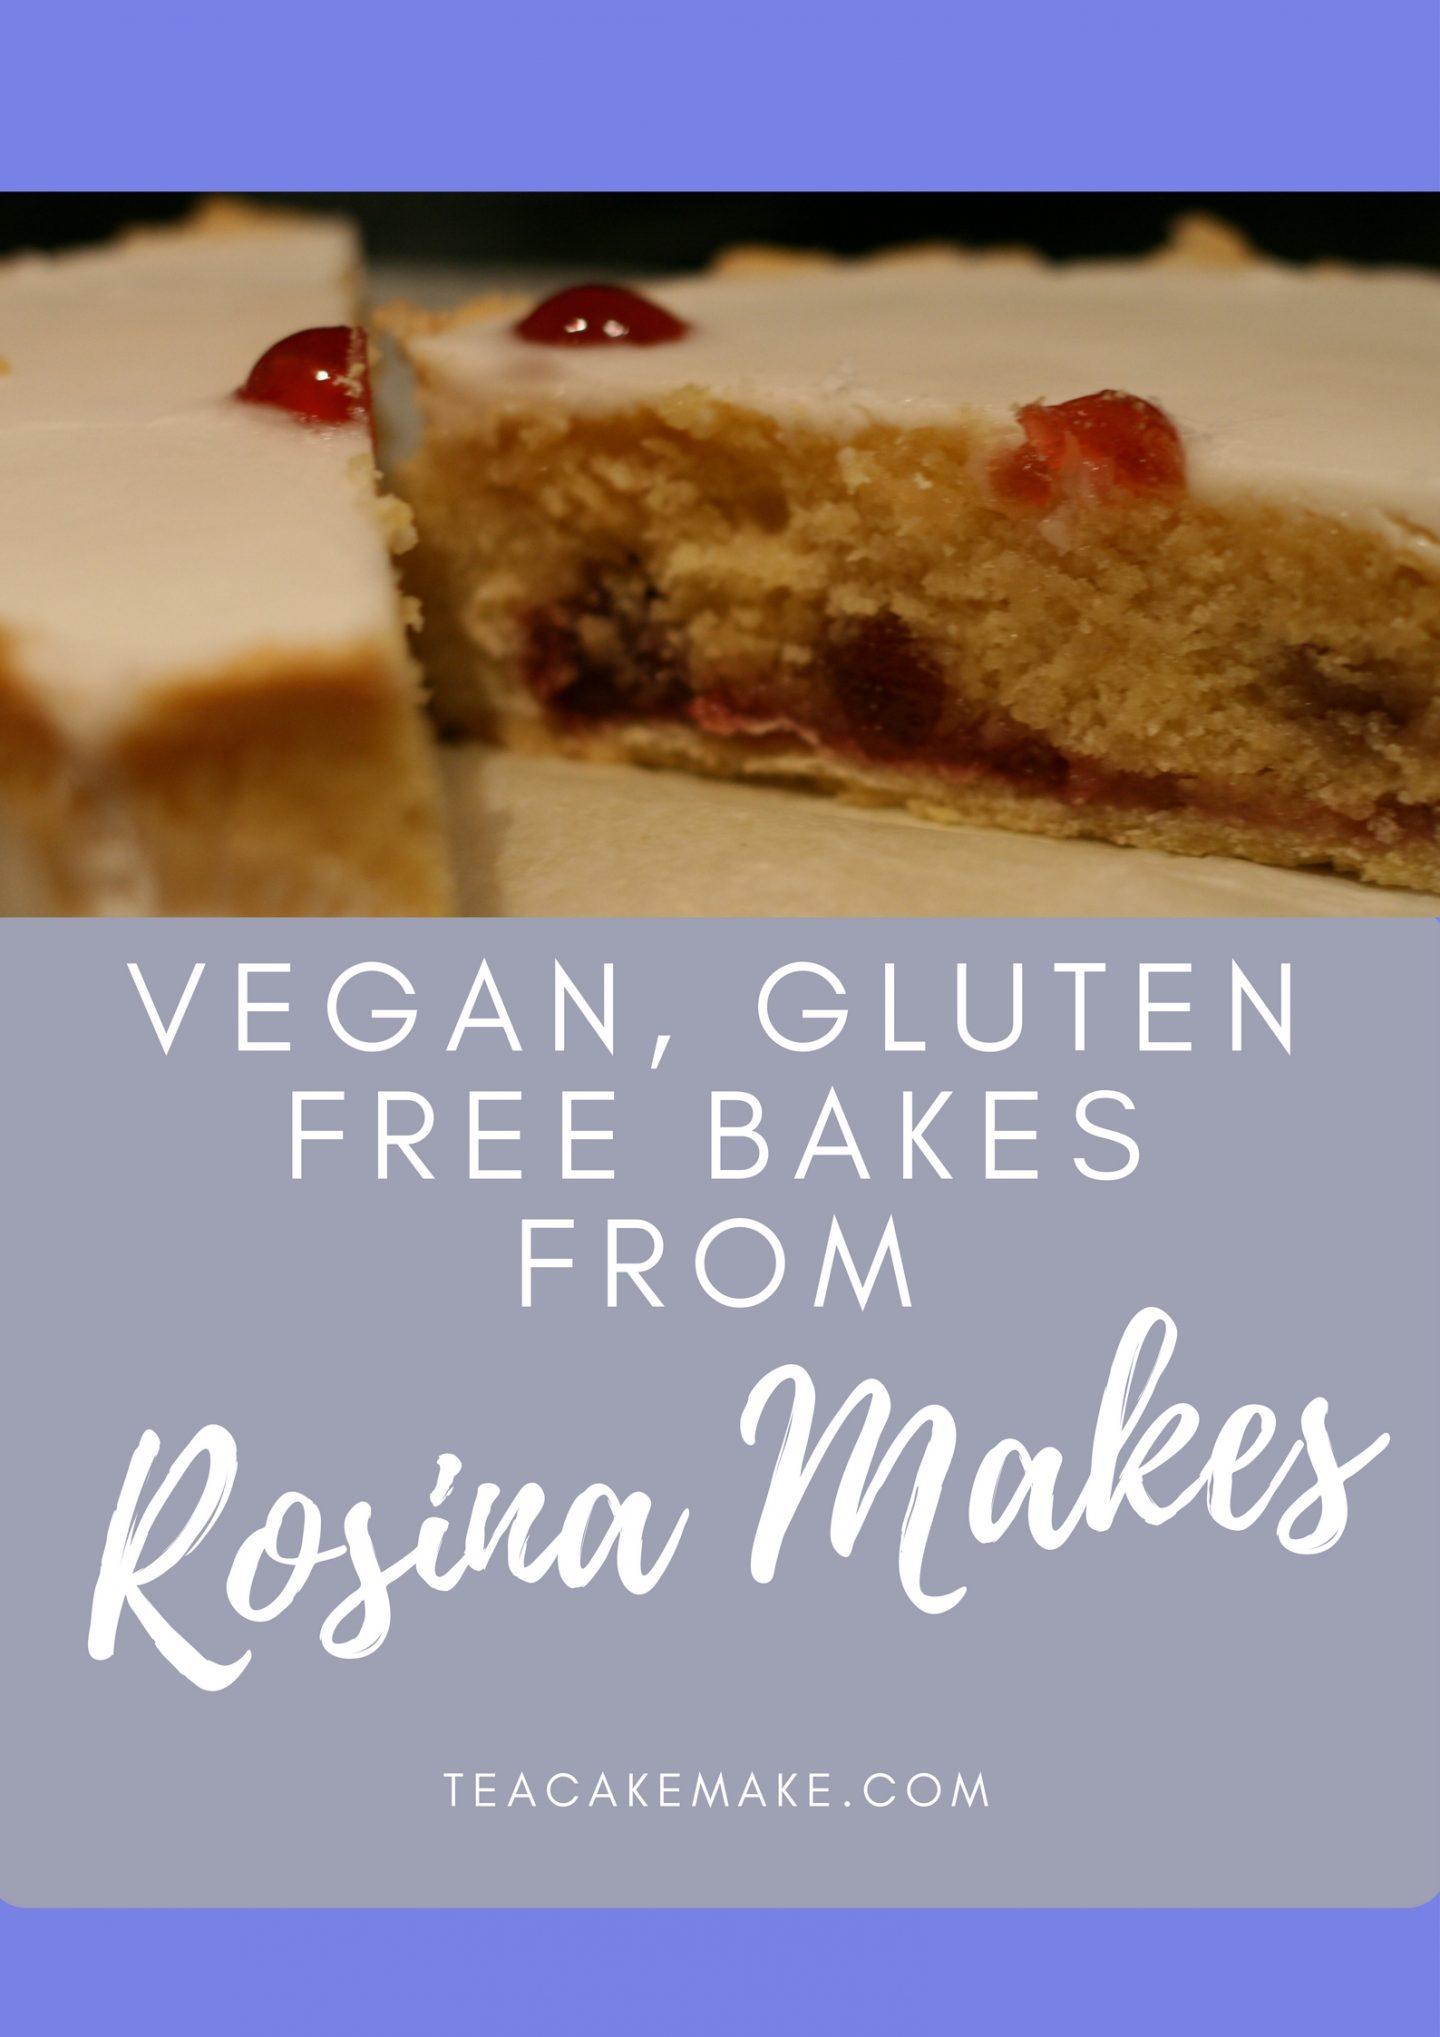 vegan gluten free bakes rosina makes